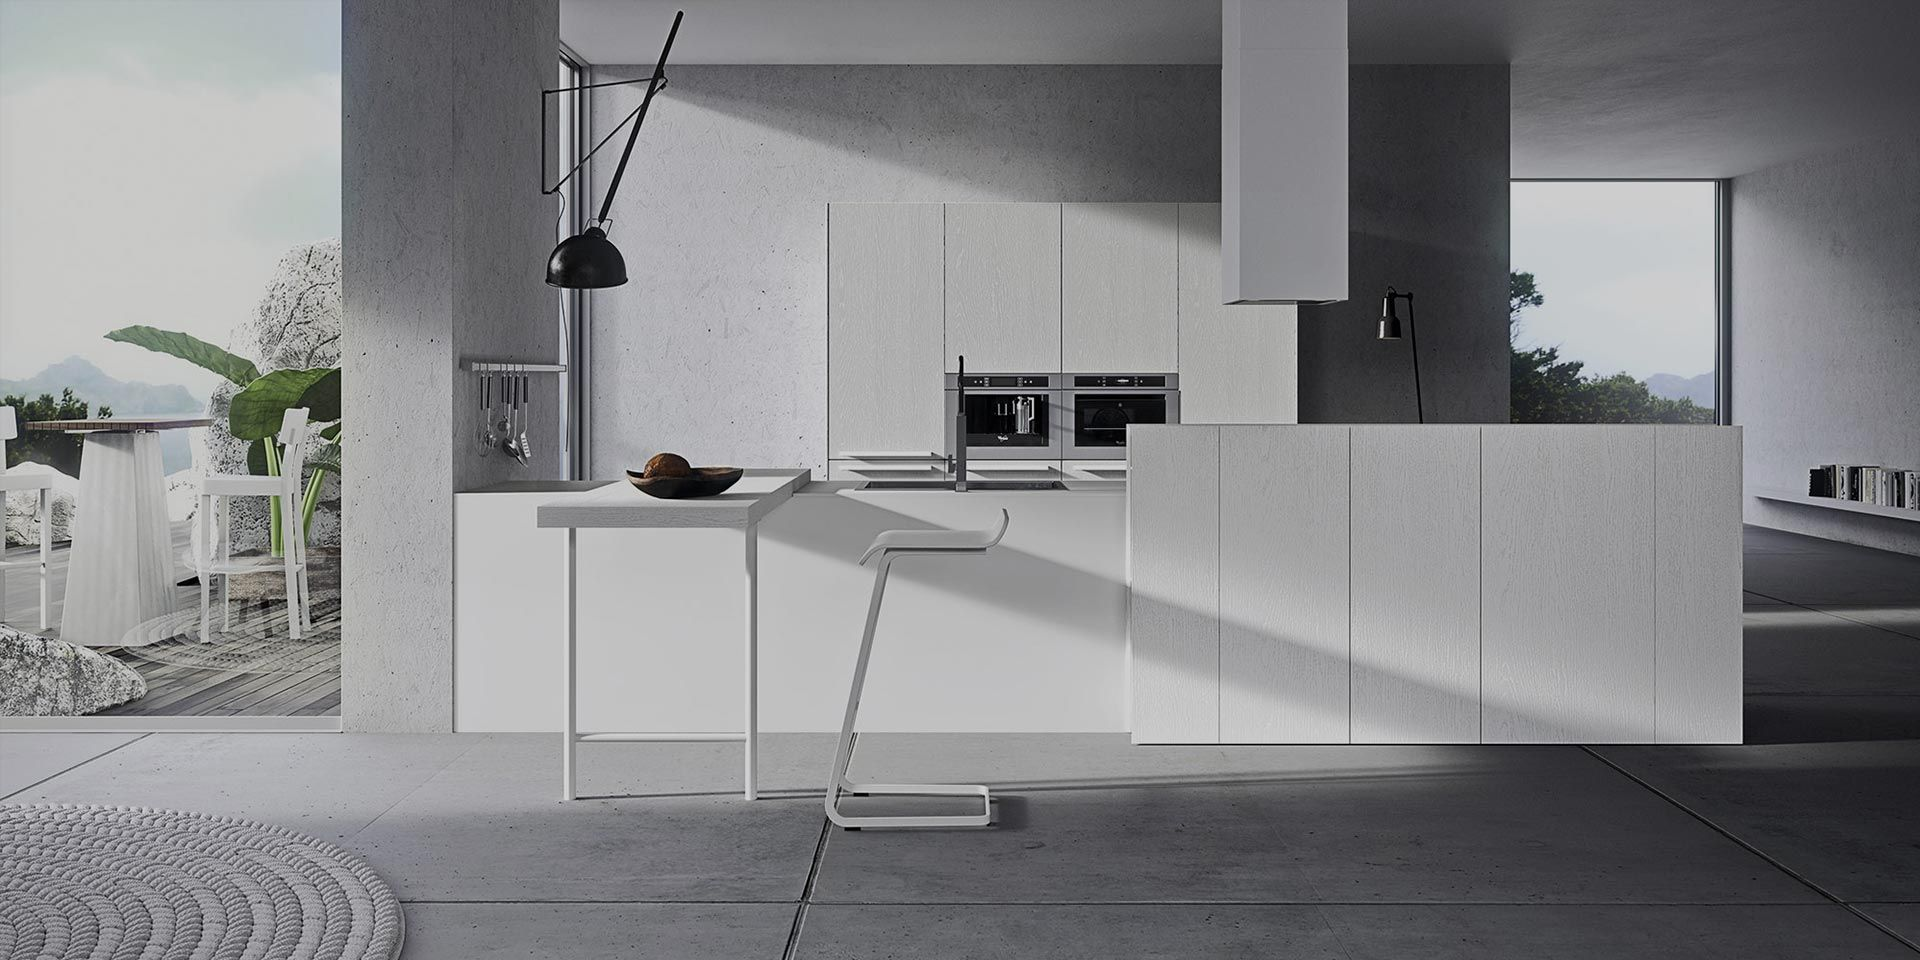 Modern italian kitchens by copatlife luxury modern italian kitchens at affordable prices visit - Copat life cucine ...